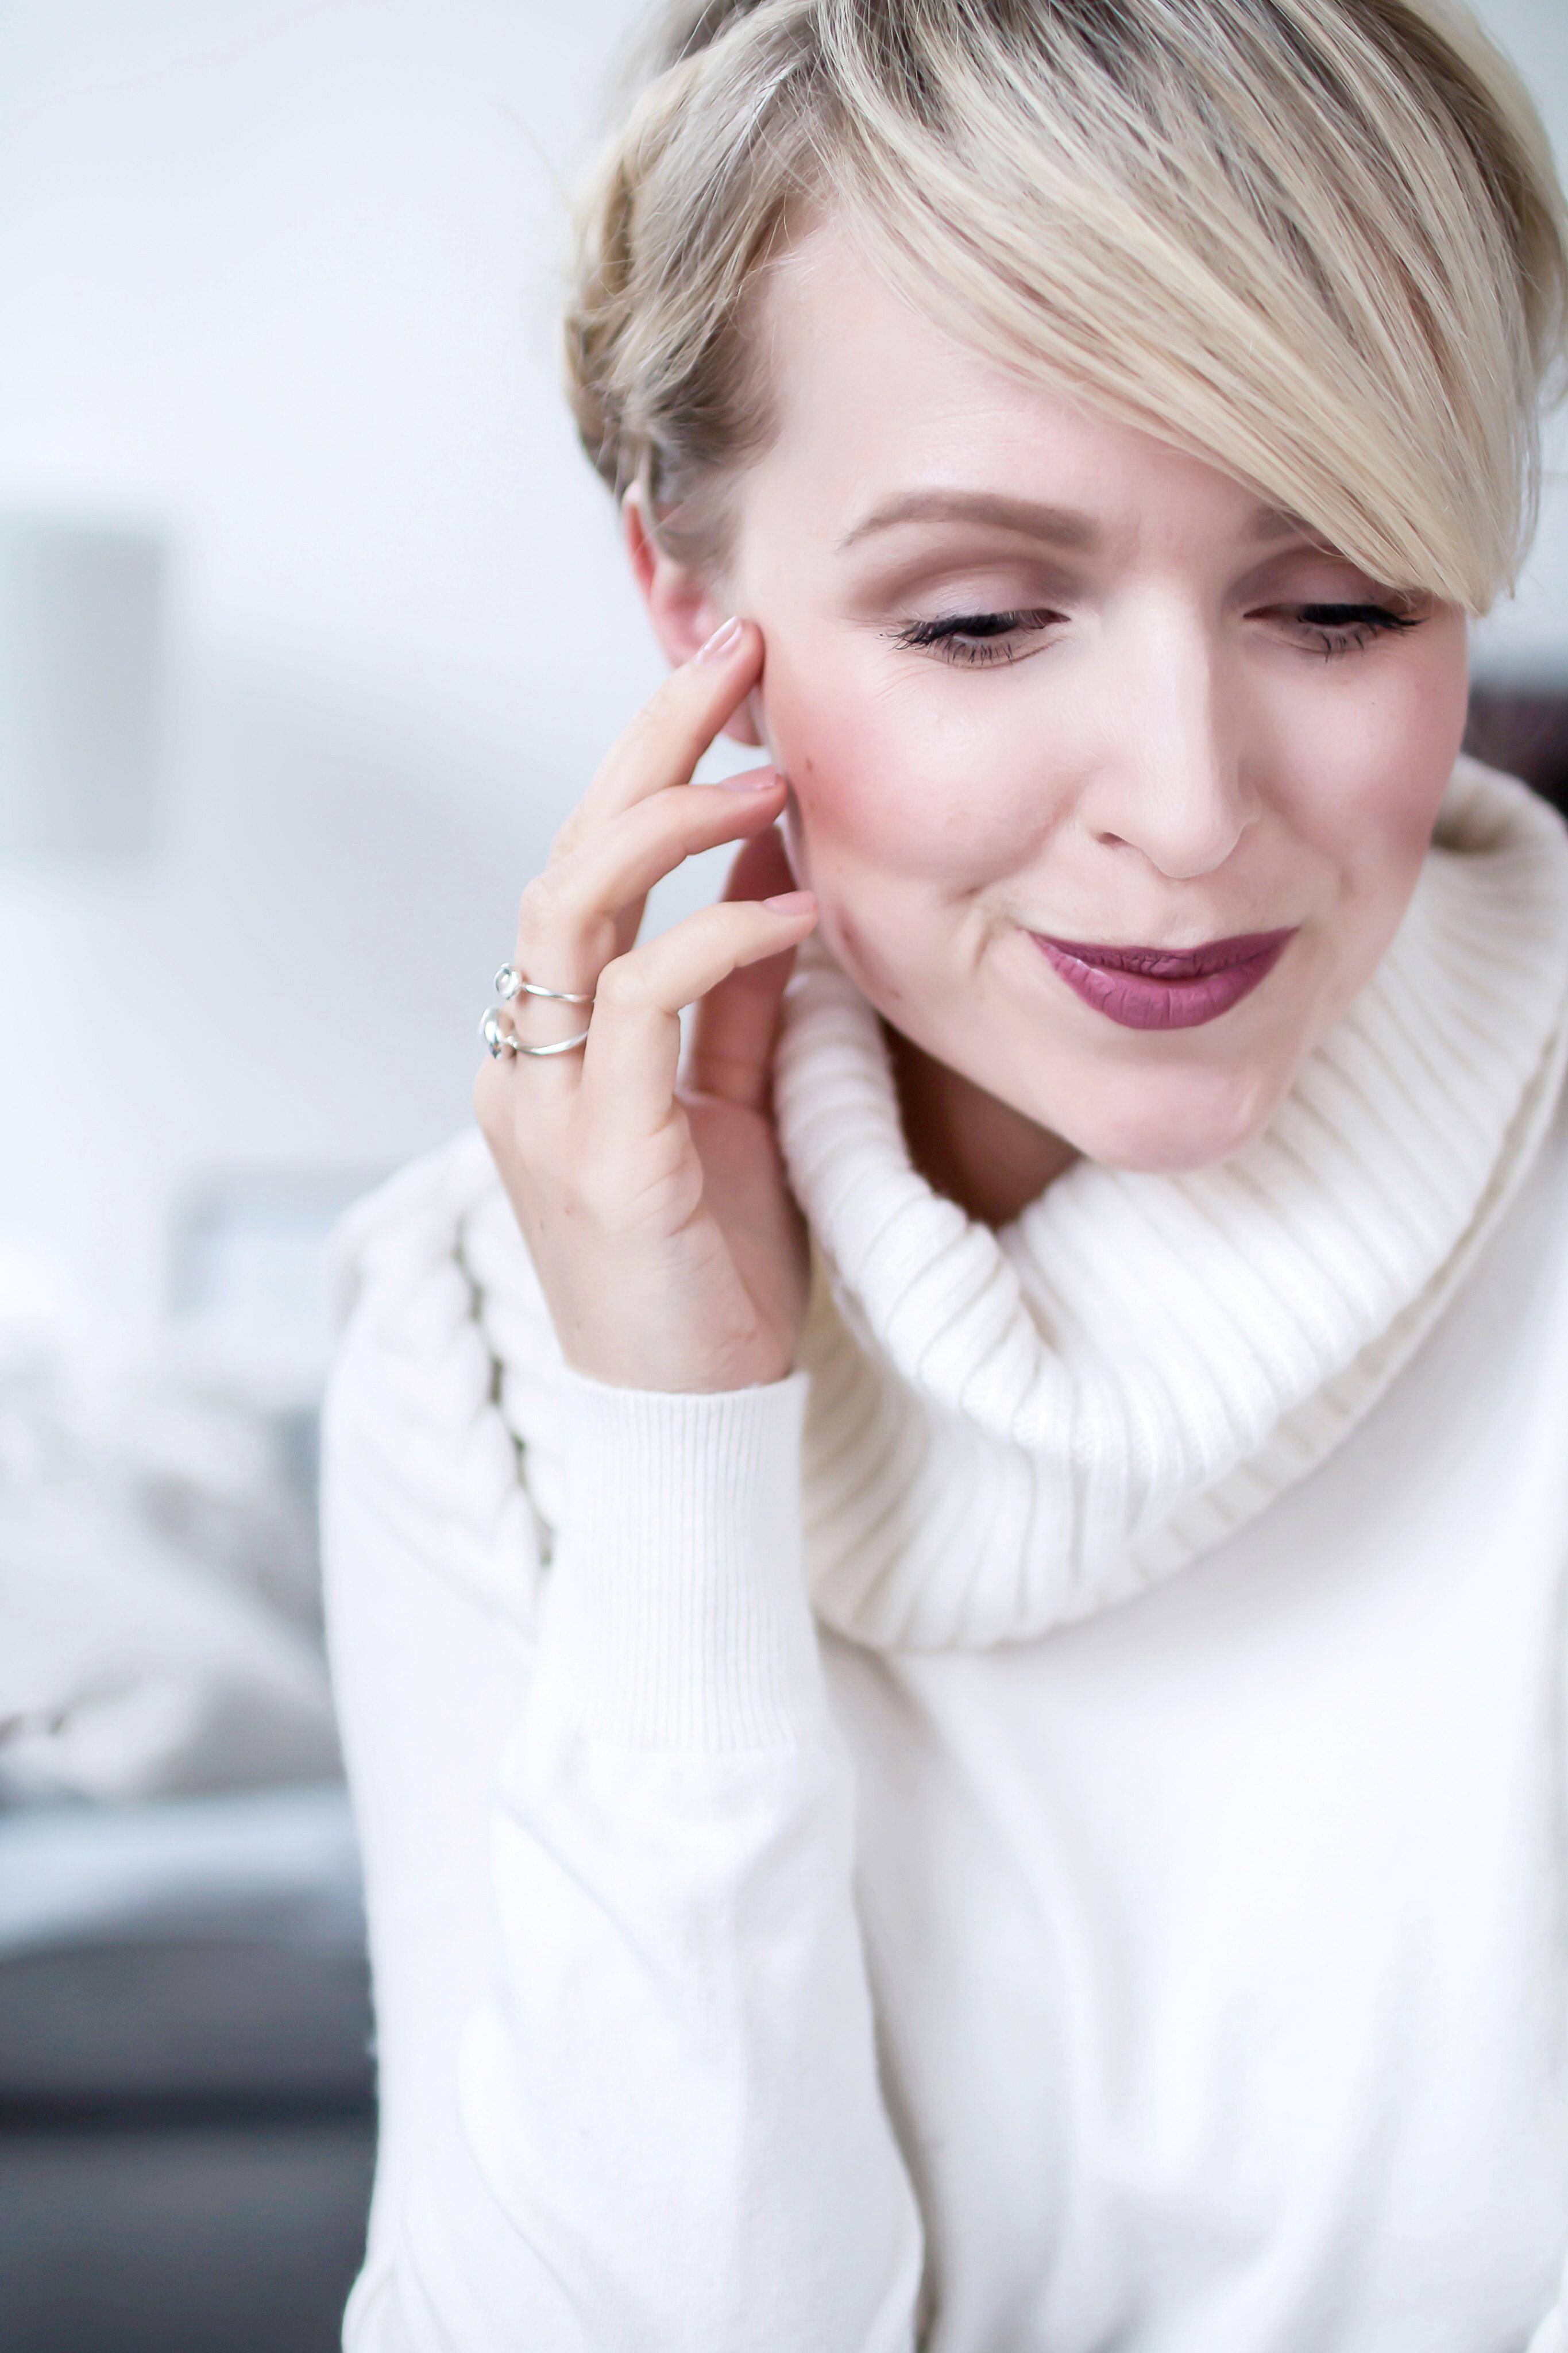 Sally_hansen_strong_woman_strong_nails_beauty_nagellack_trend_blogger